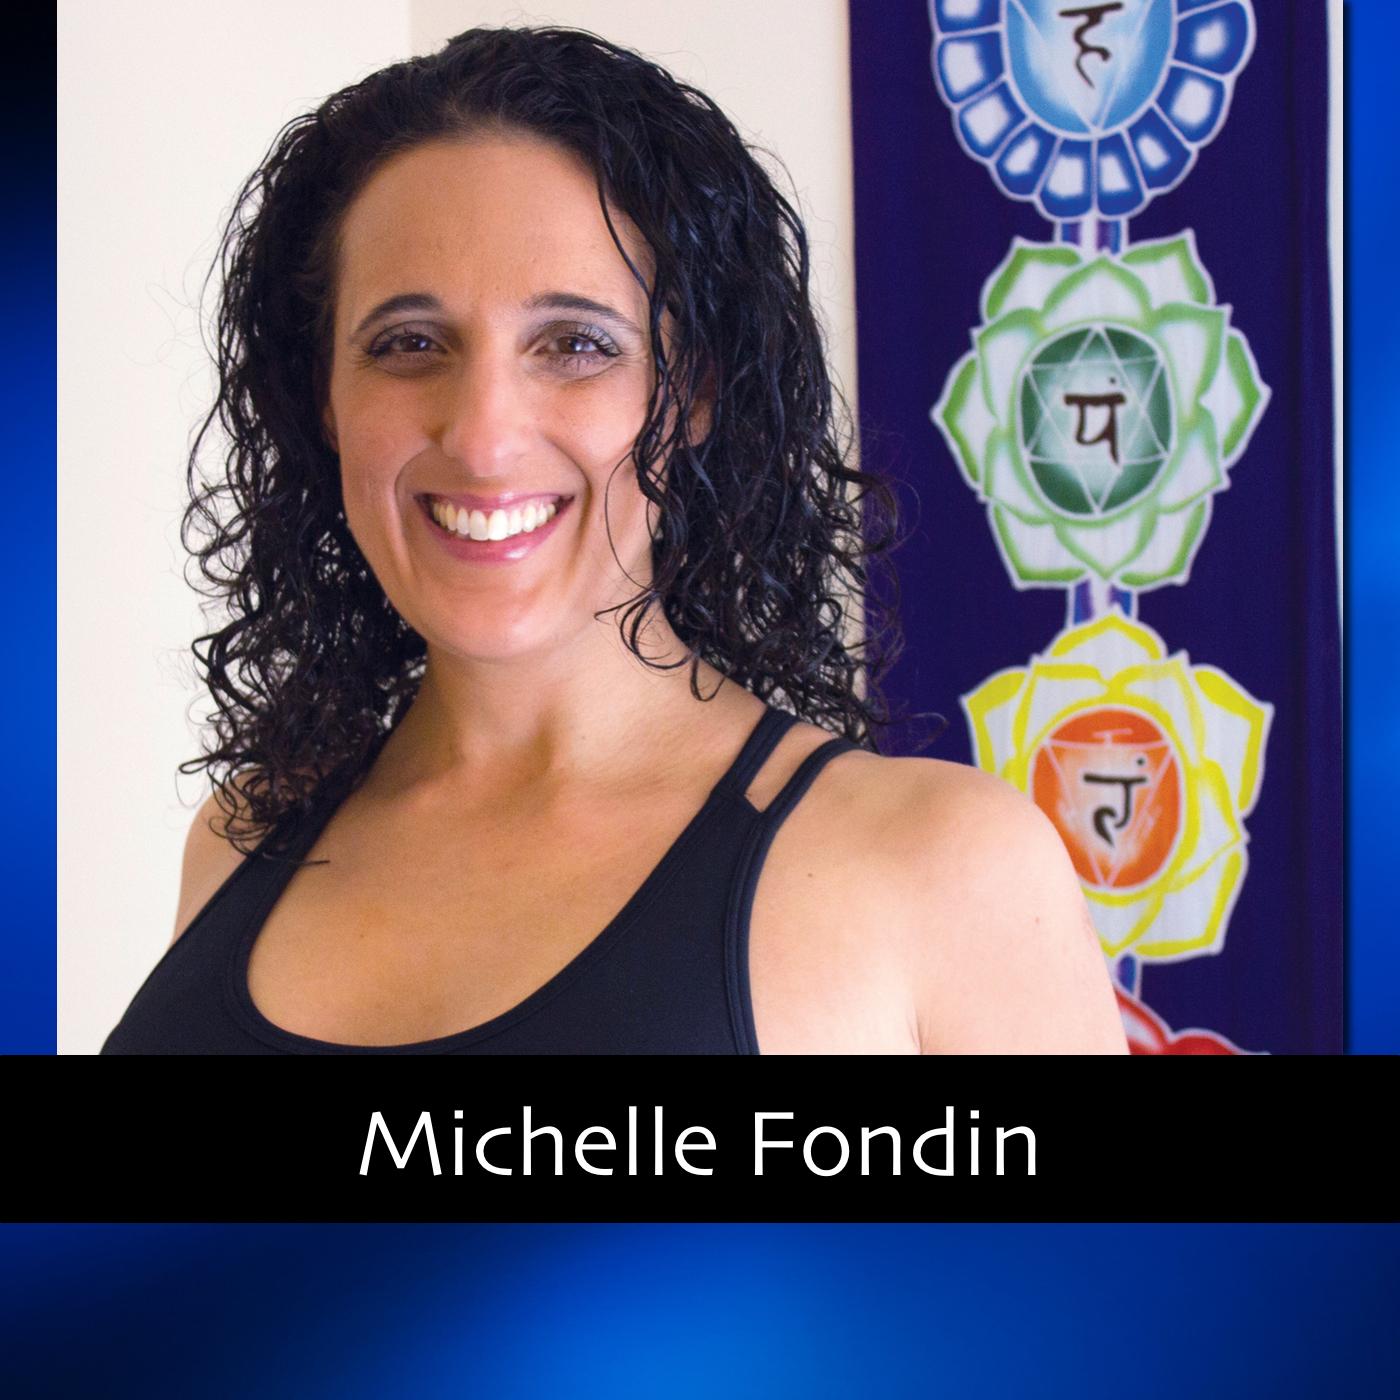 Michelle Fondin Thumb.jpg